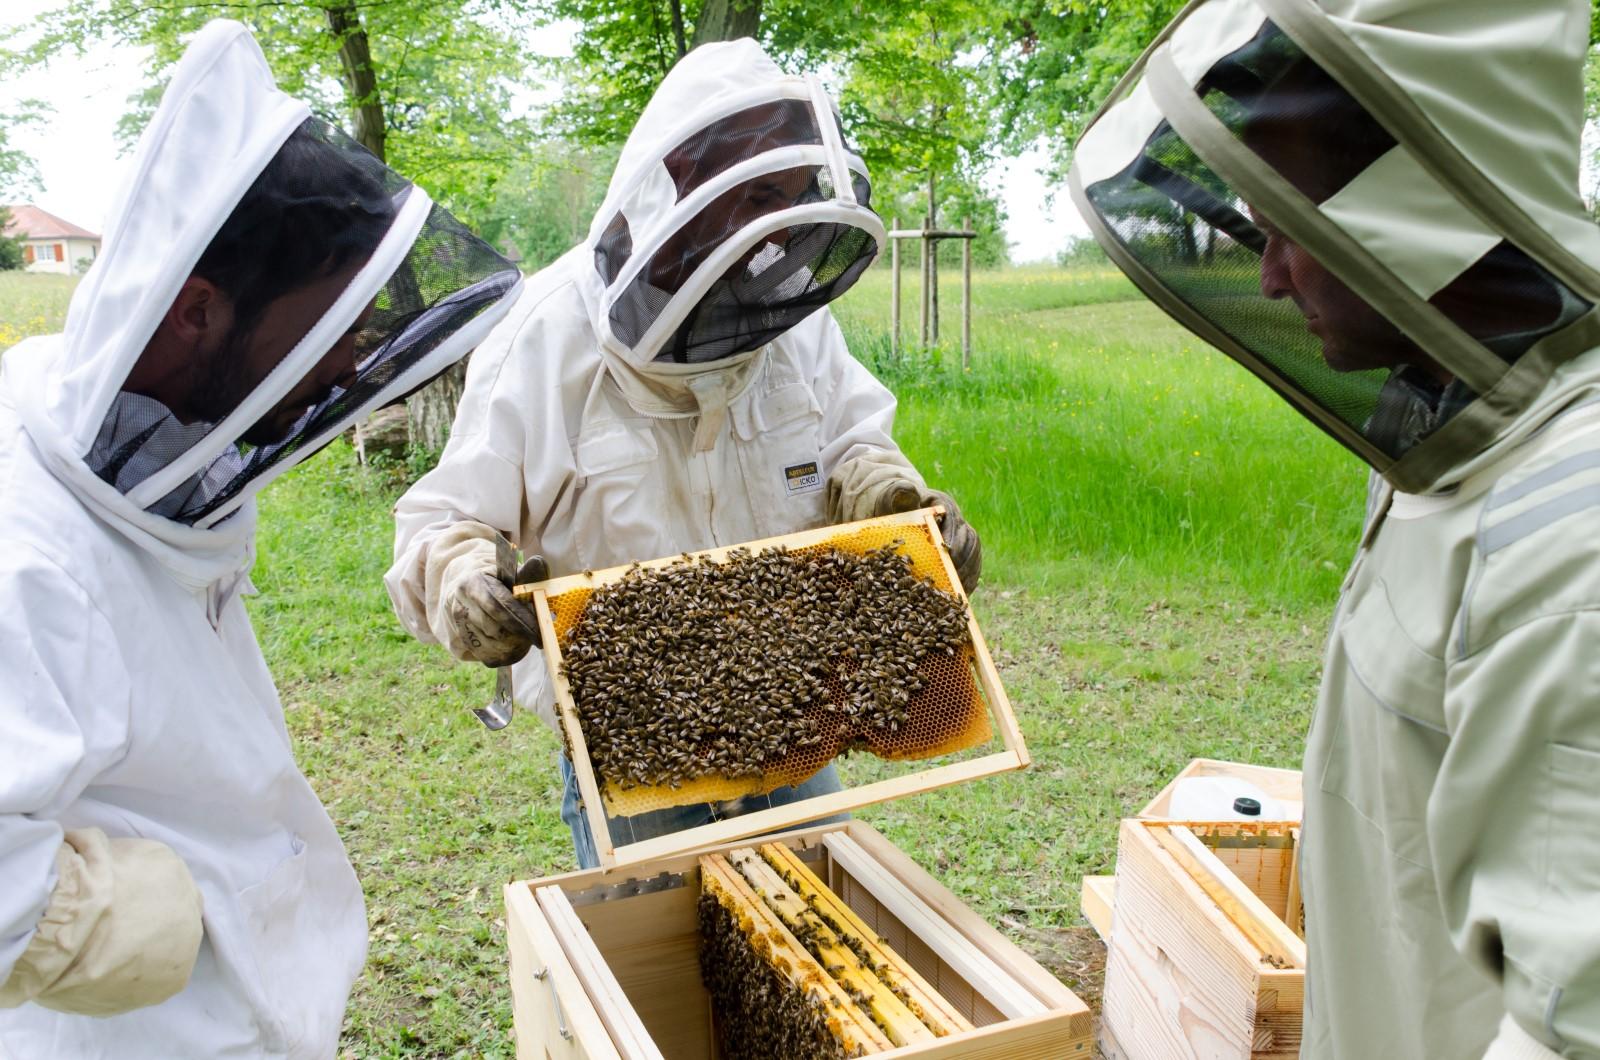 Installation ruches abeilles apiculteurs